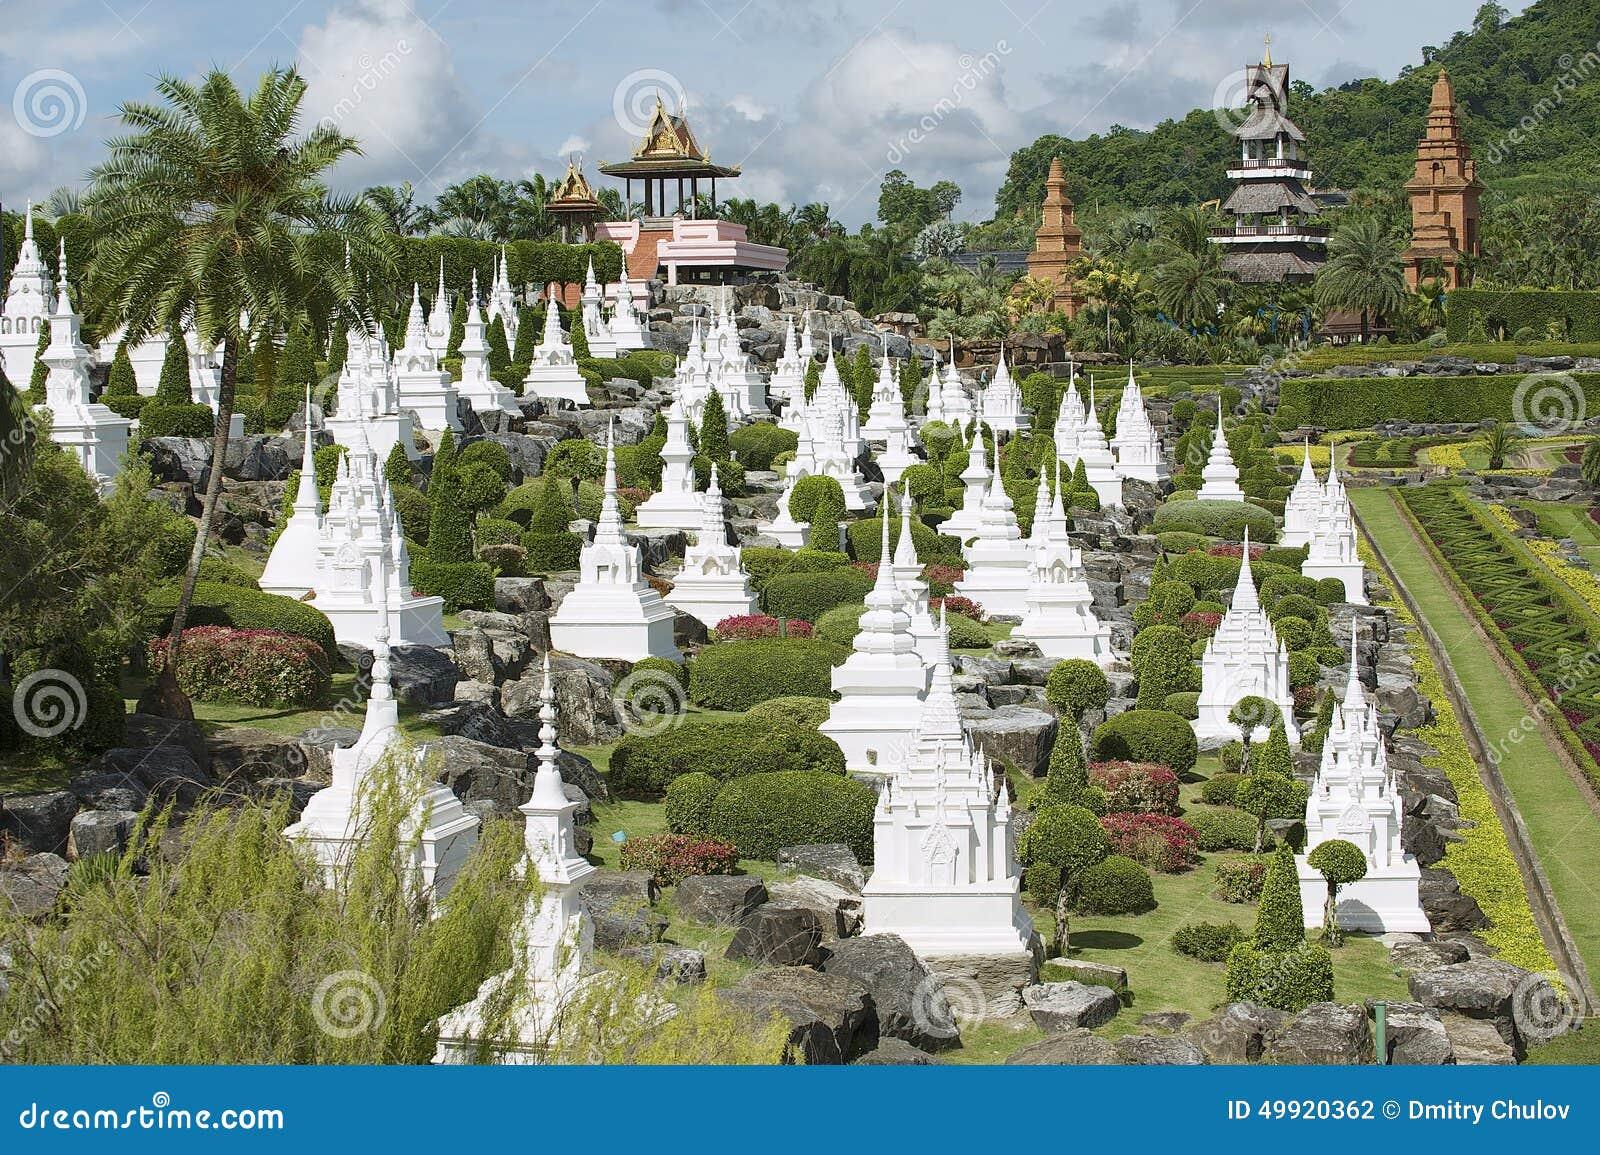 Nong Nooch Tropical Botanical Garden Pattaya Chonburi Thailand Stock Photo Image 49920362